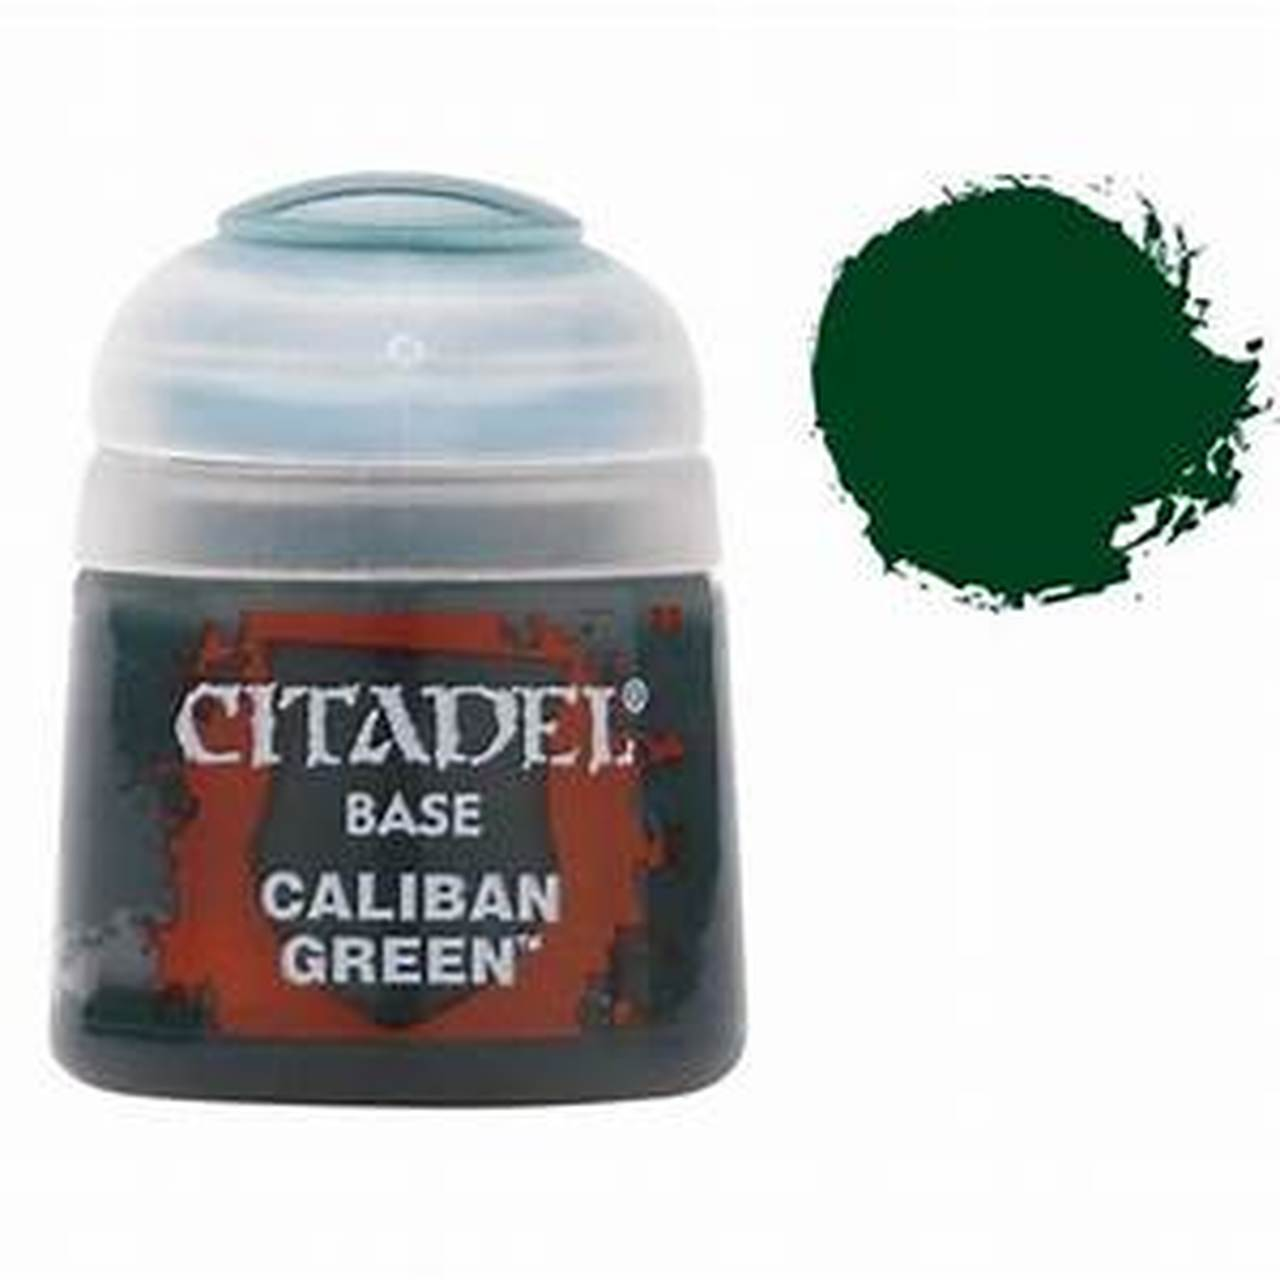 Base Caliban Green